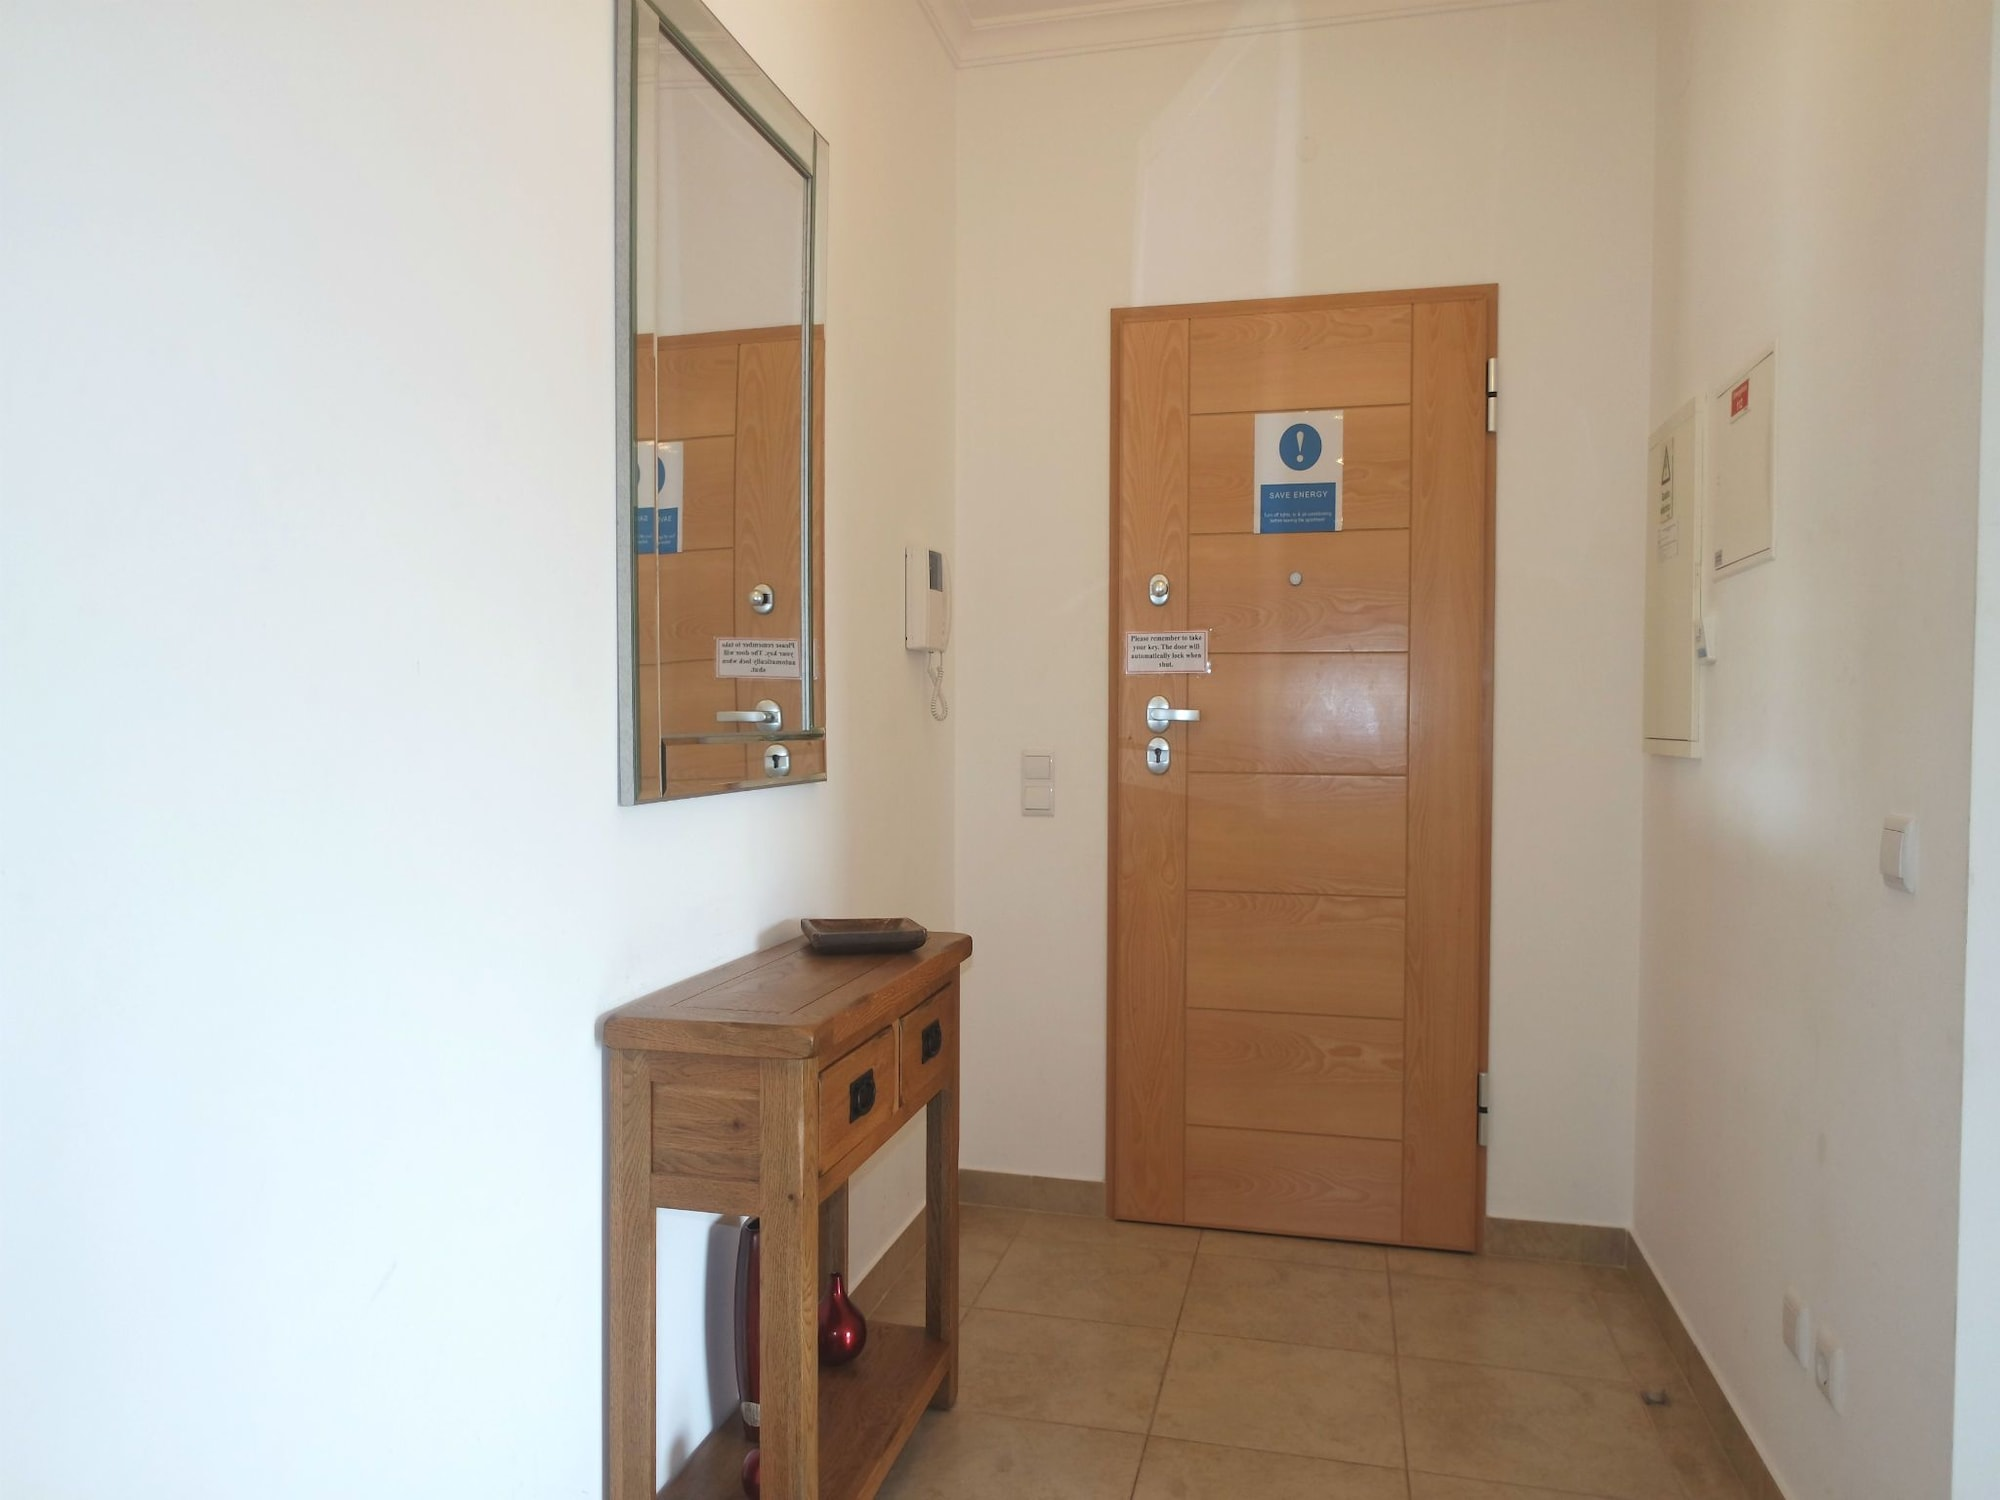 B25 - Abrotea 2 Bed Apartment by DreamAlgarve, Lagos